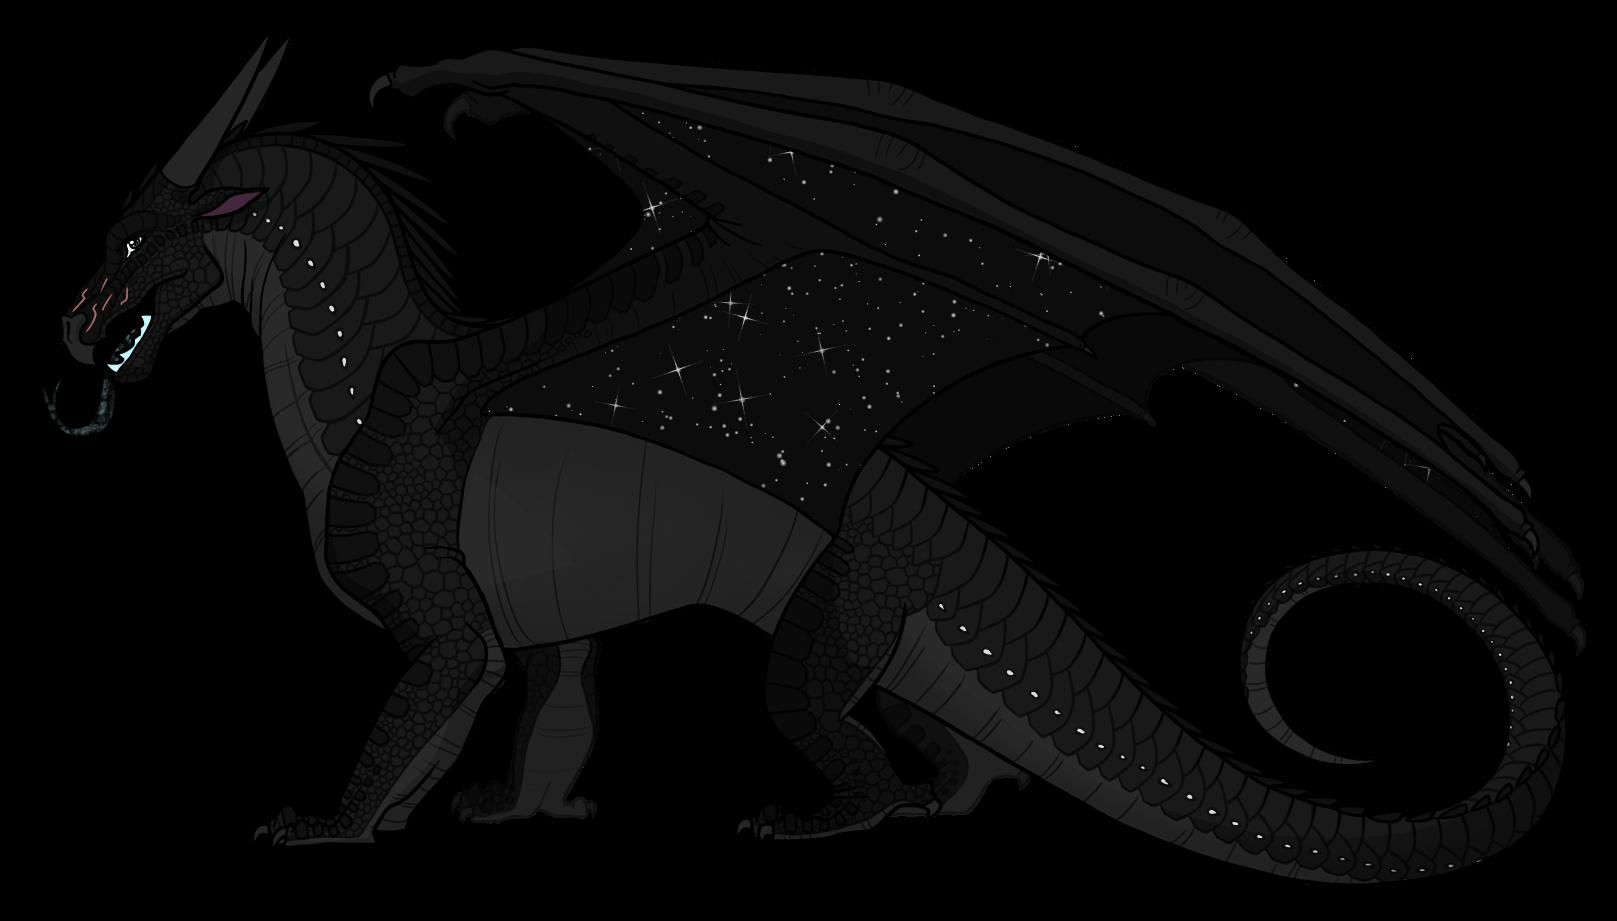 Death clipart dead dragon. Queen battlewinner wings of